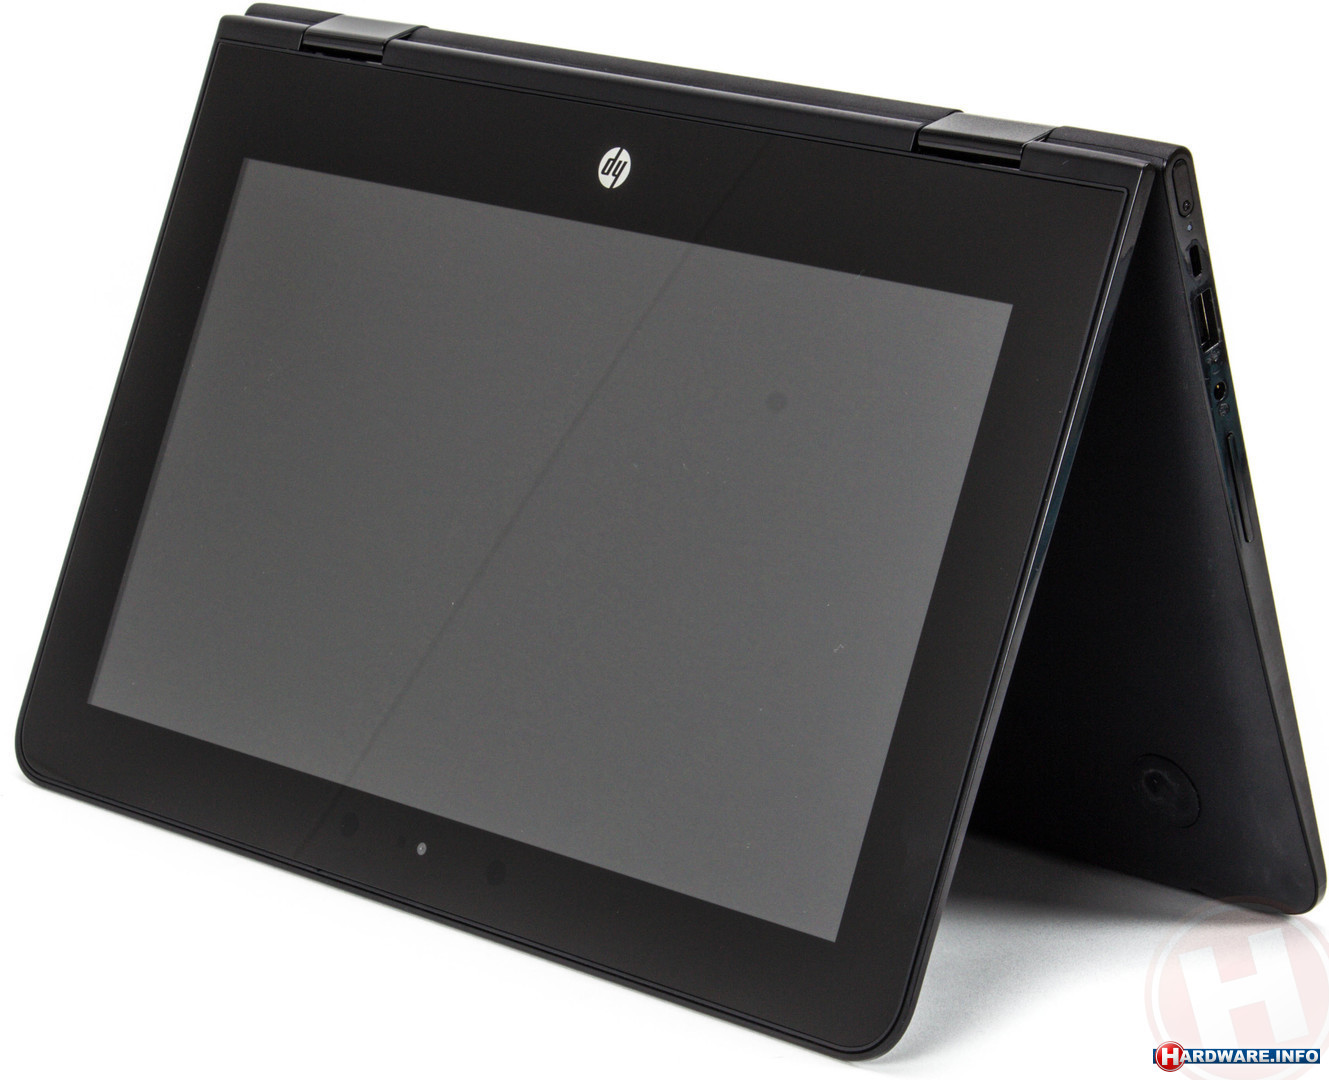 HP Stream x360 11-aa000nd (Y3X38EA) laptop/tablet - Hardware